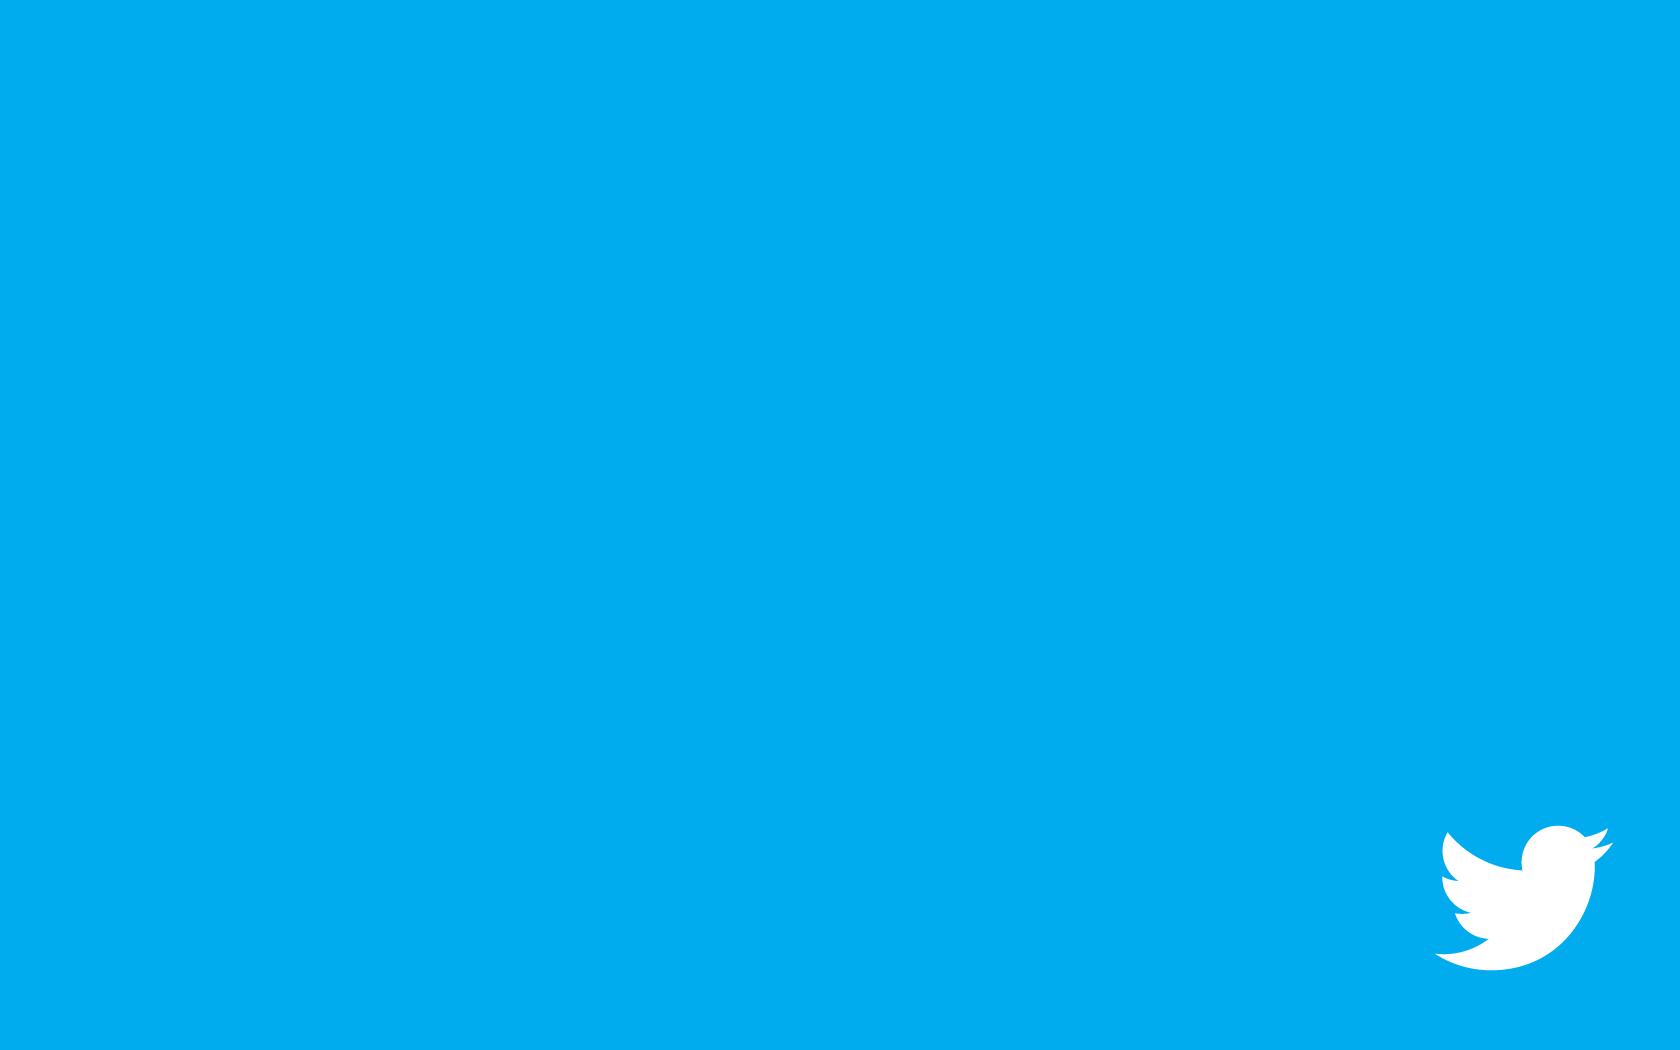 Wallpaper Blue Social Networks Twitter Shape Line